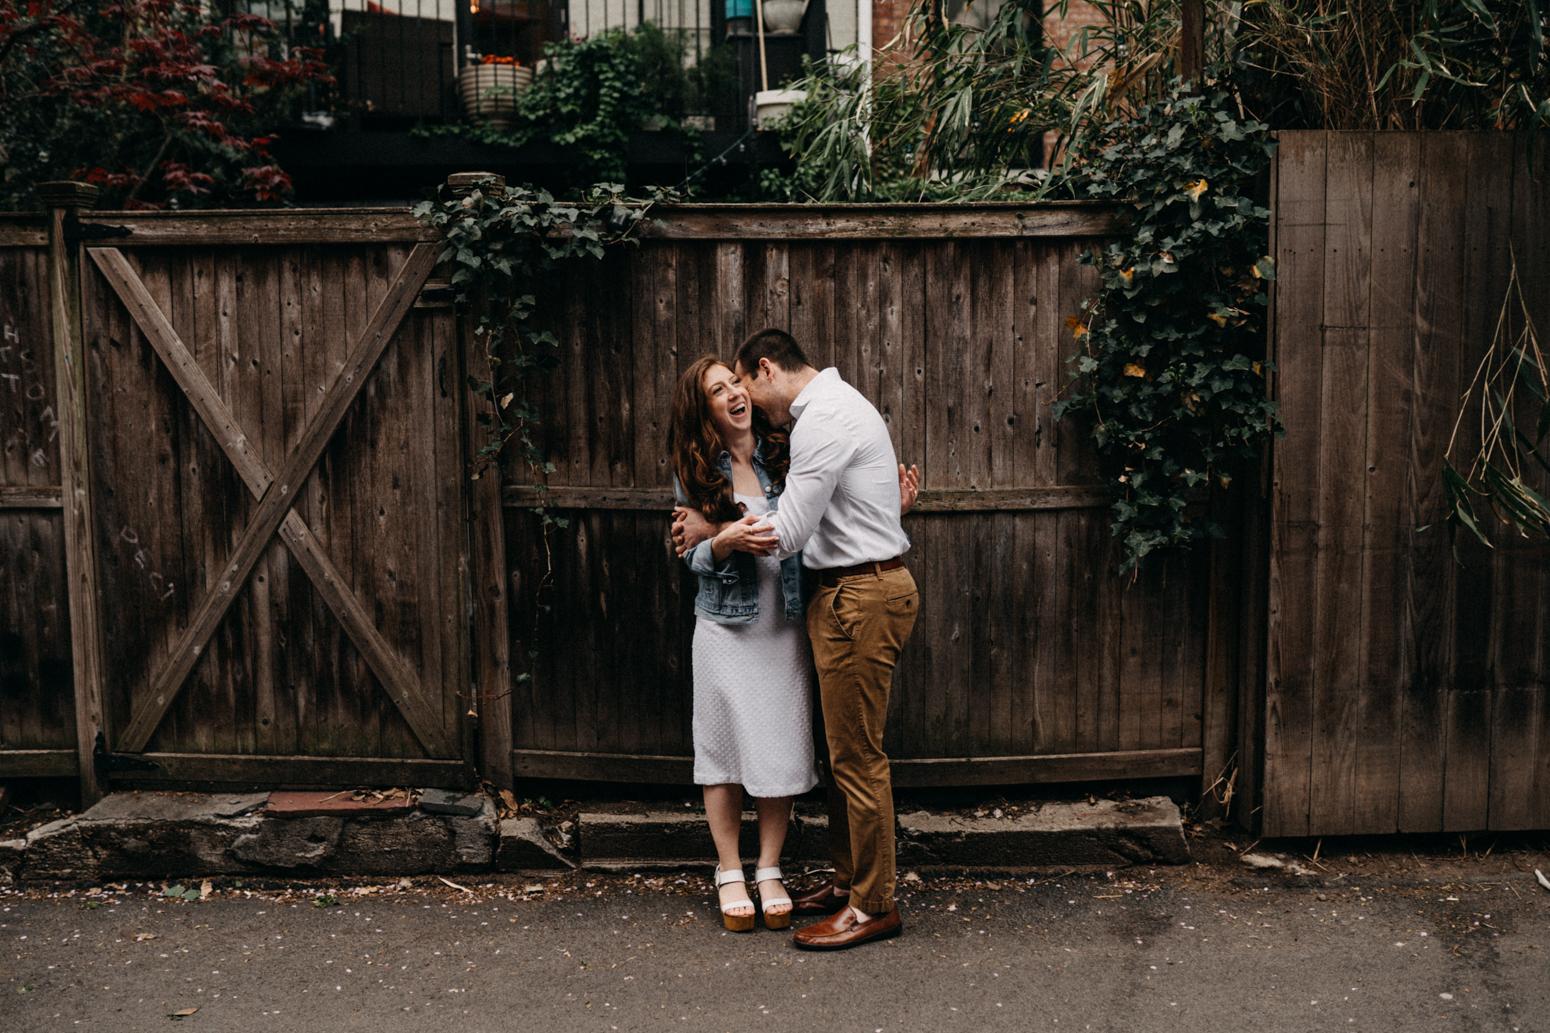 New York City Wedding Photographer (44 of 59).JPG